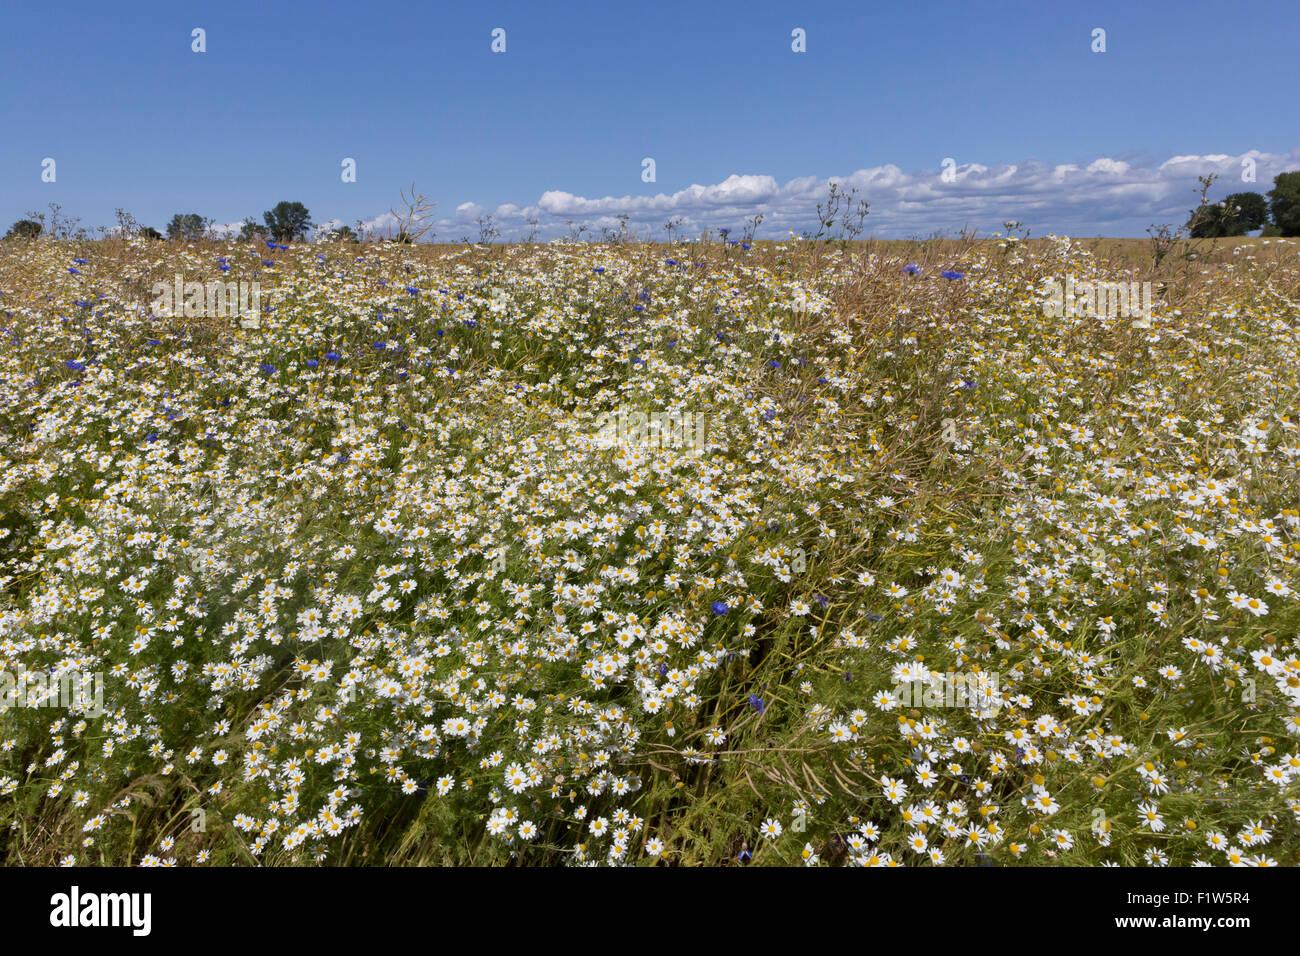 Wildflowers (Bellis perennis or Common Daisies) on the island of Aero, Denmark - Stock Image